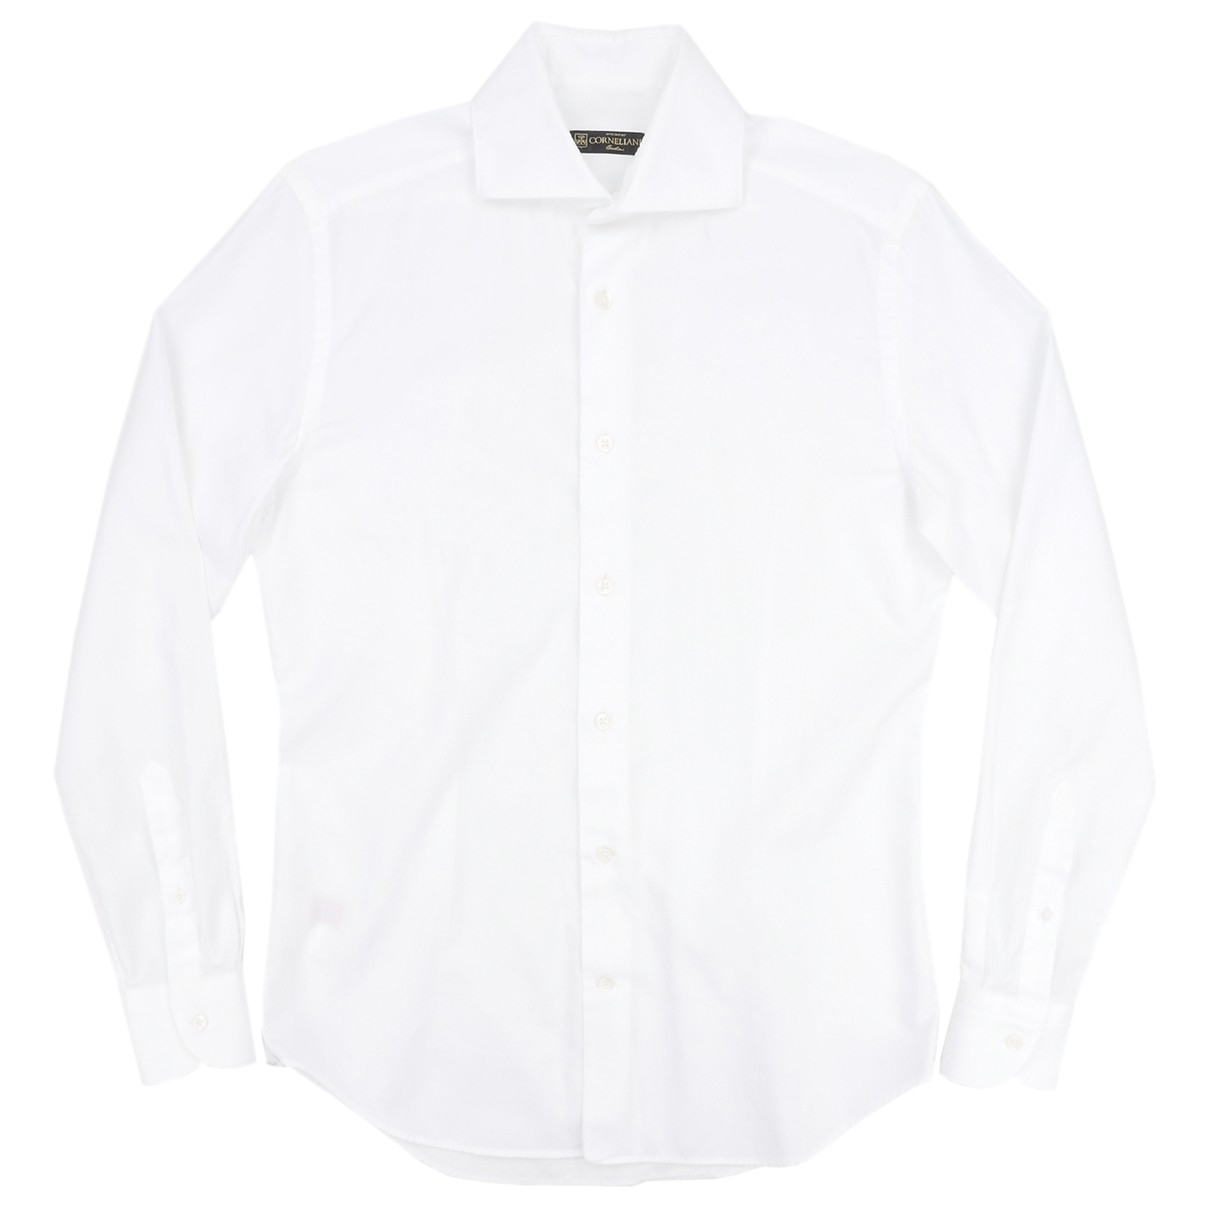 Corneliani \N White Cotton Shirts for Men 38 EU (tour de cou / collar)